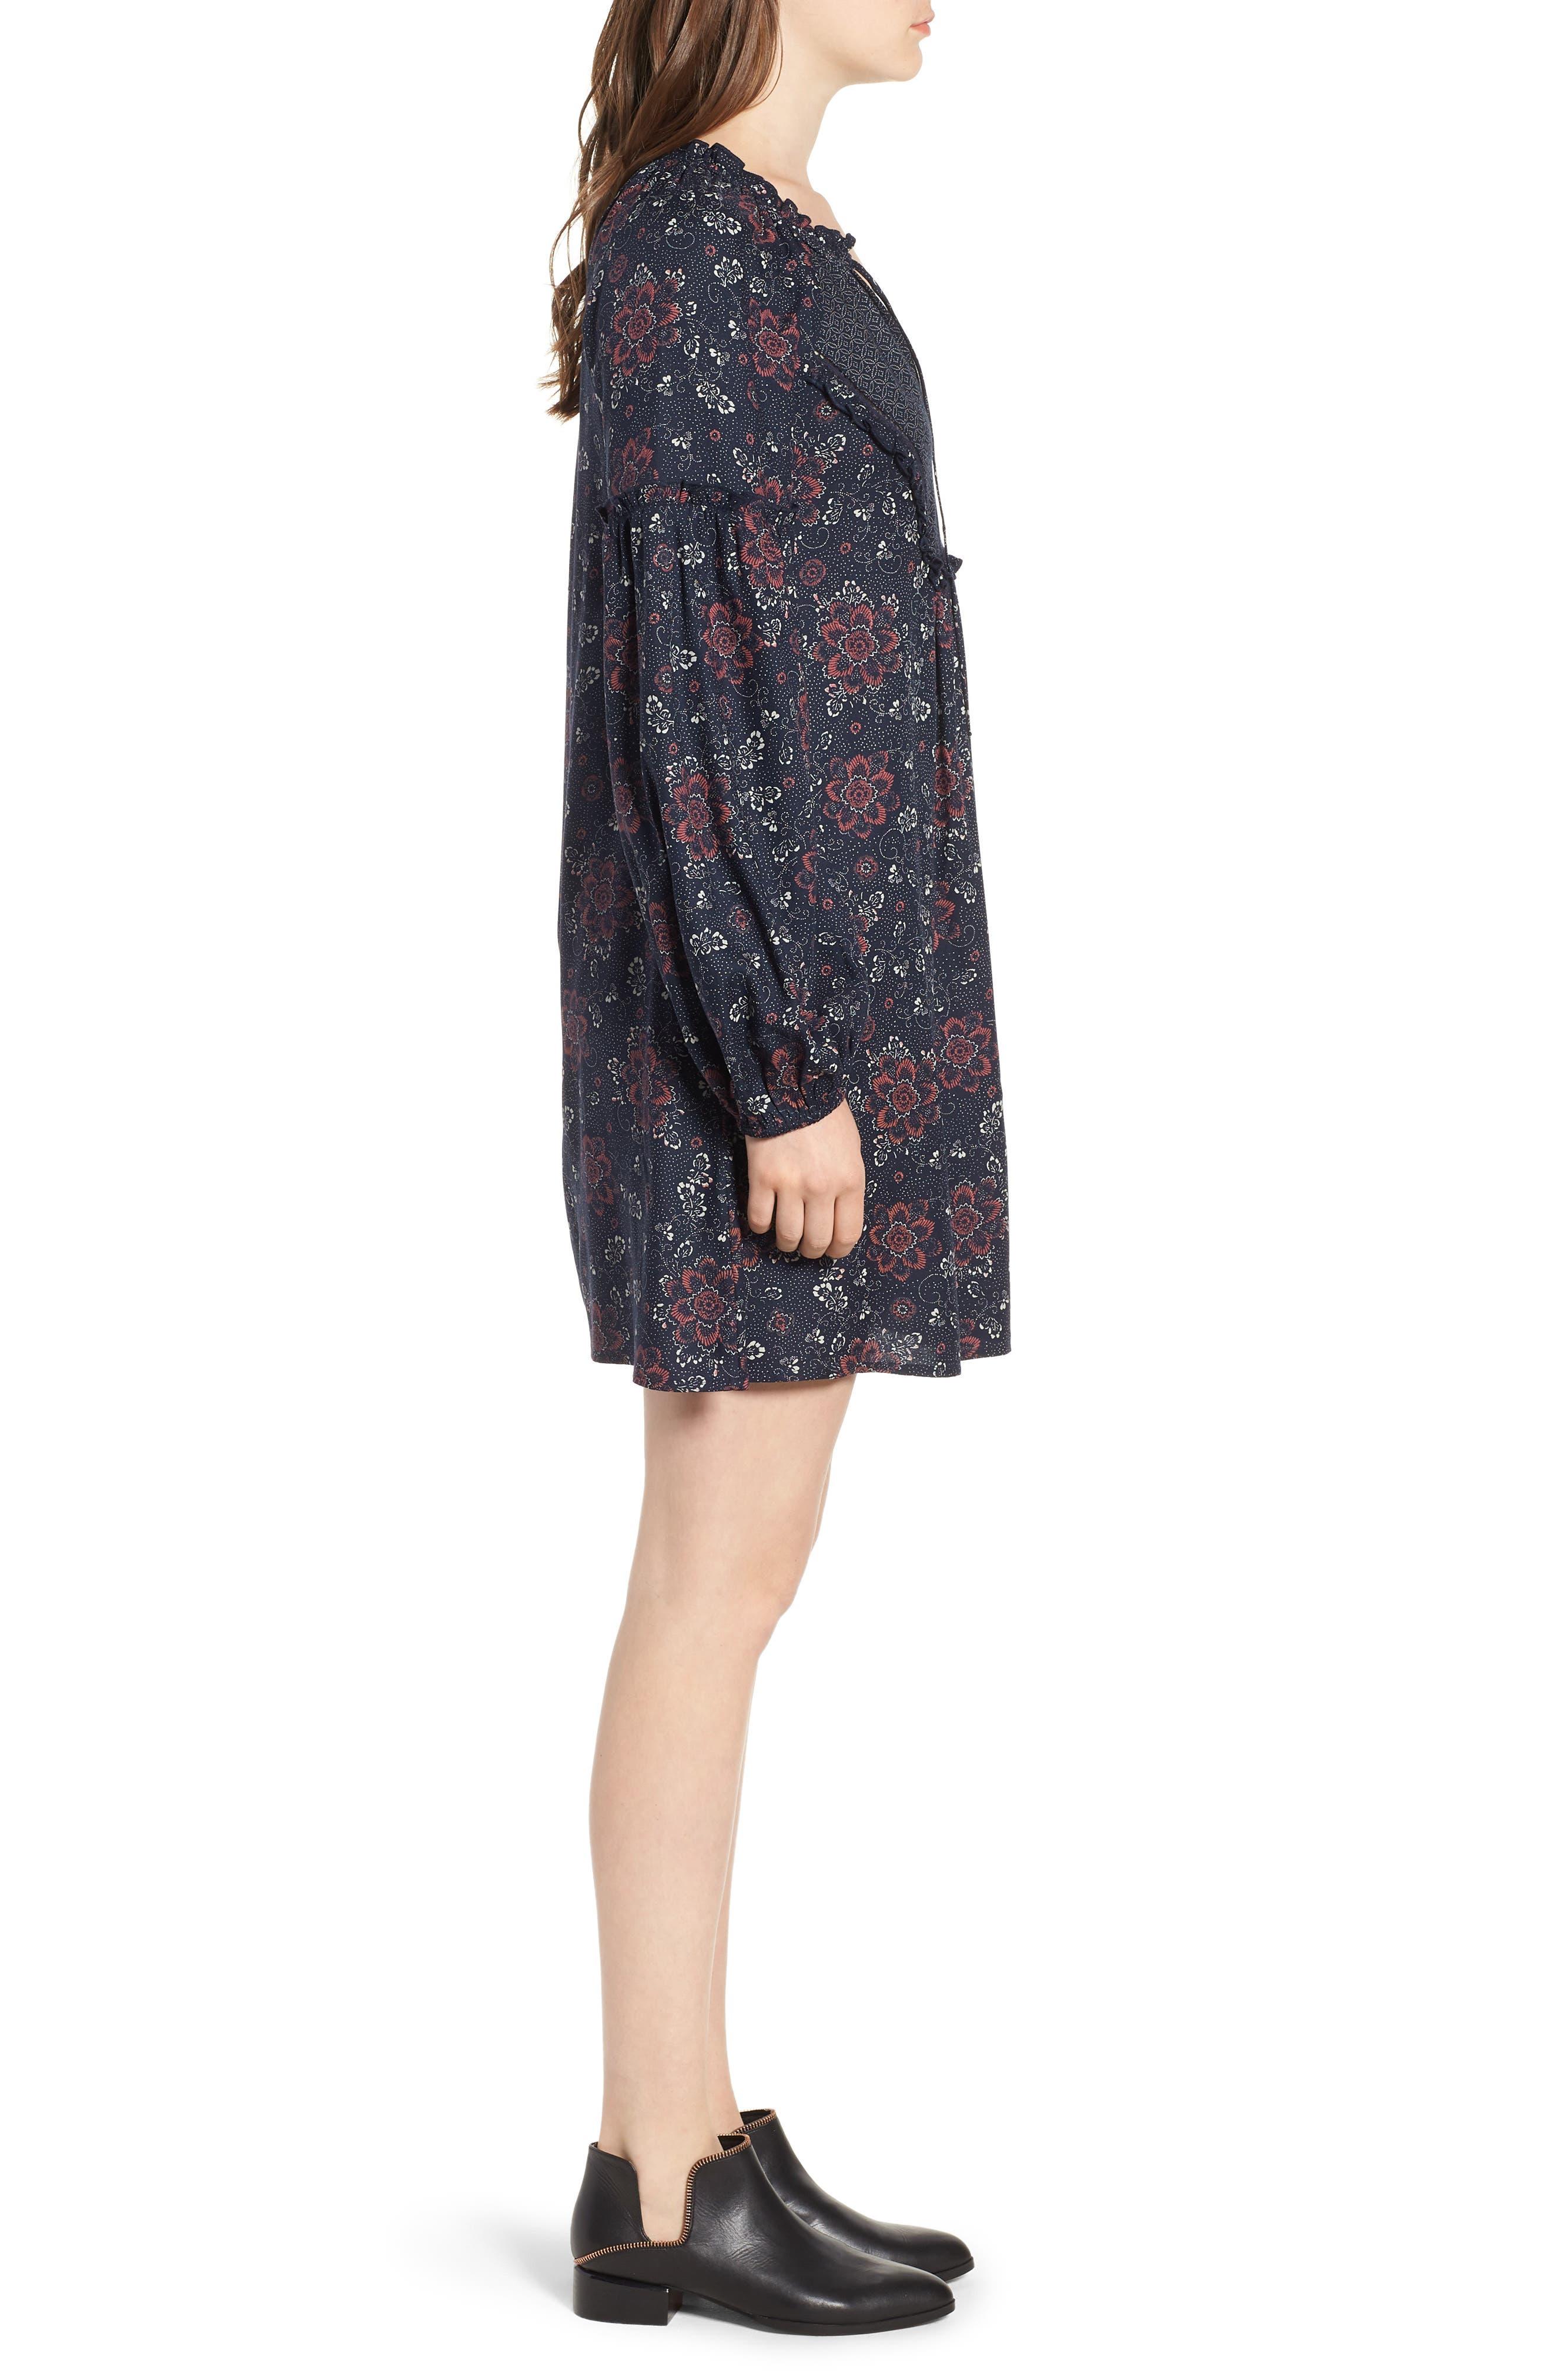 Mix Print Peasant Dress,                             Alternate thumbnail 3, color,                             NAVY NIGHT WOVEN FLORAL MIX